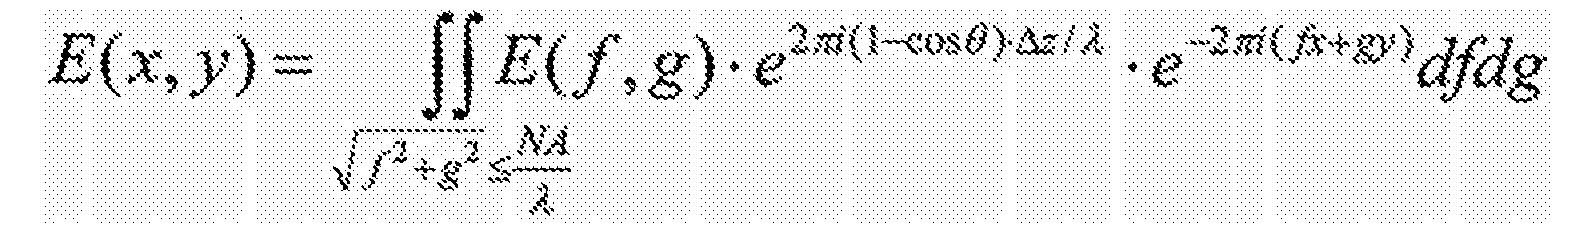 Figure CN107636538AD00083